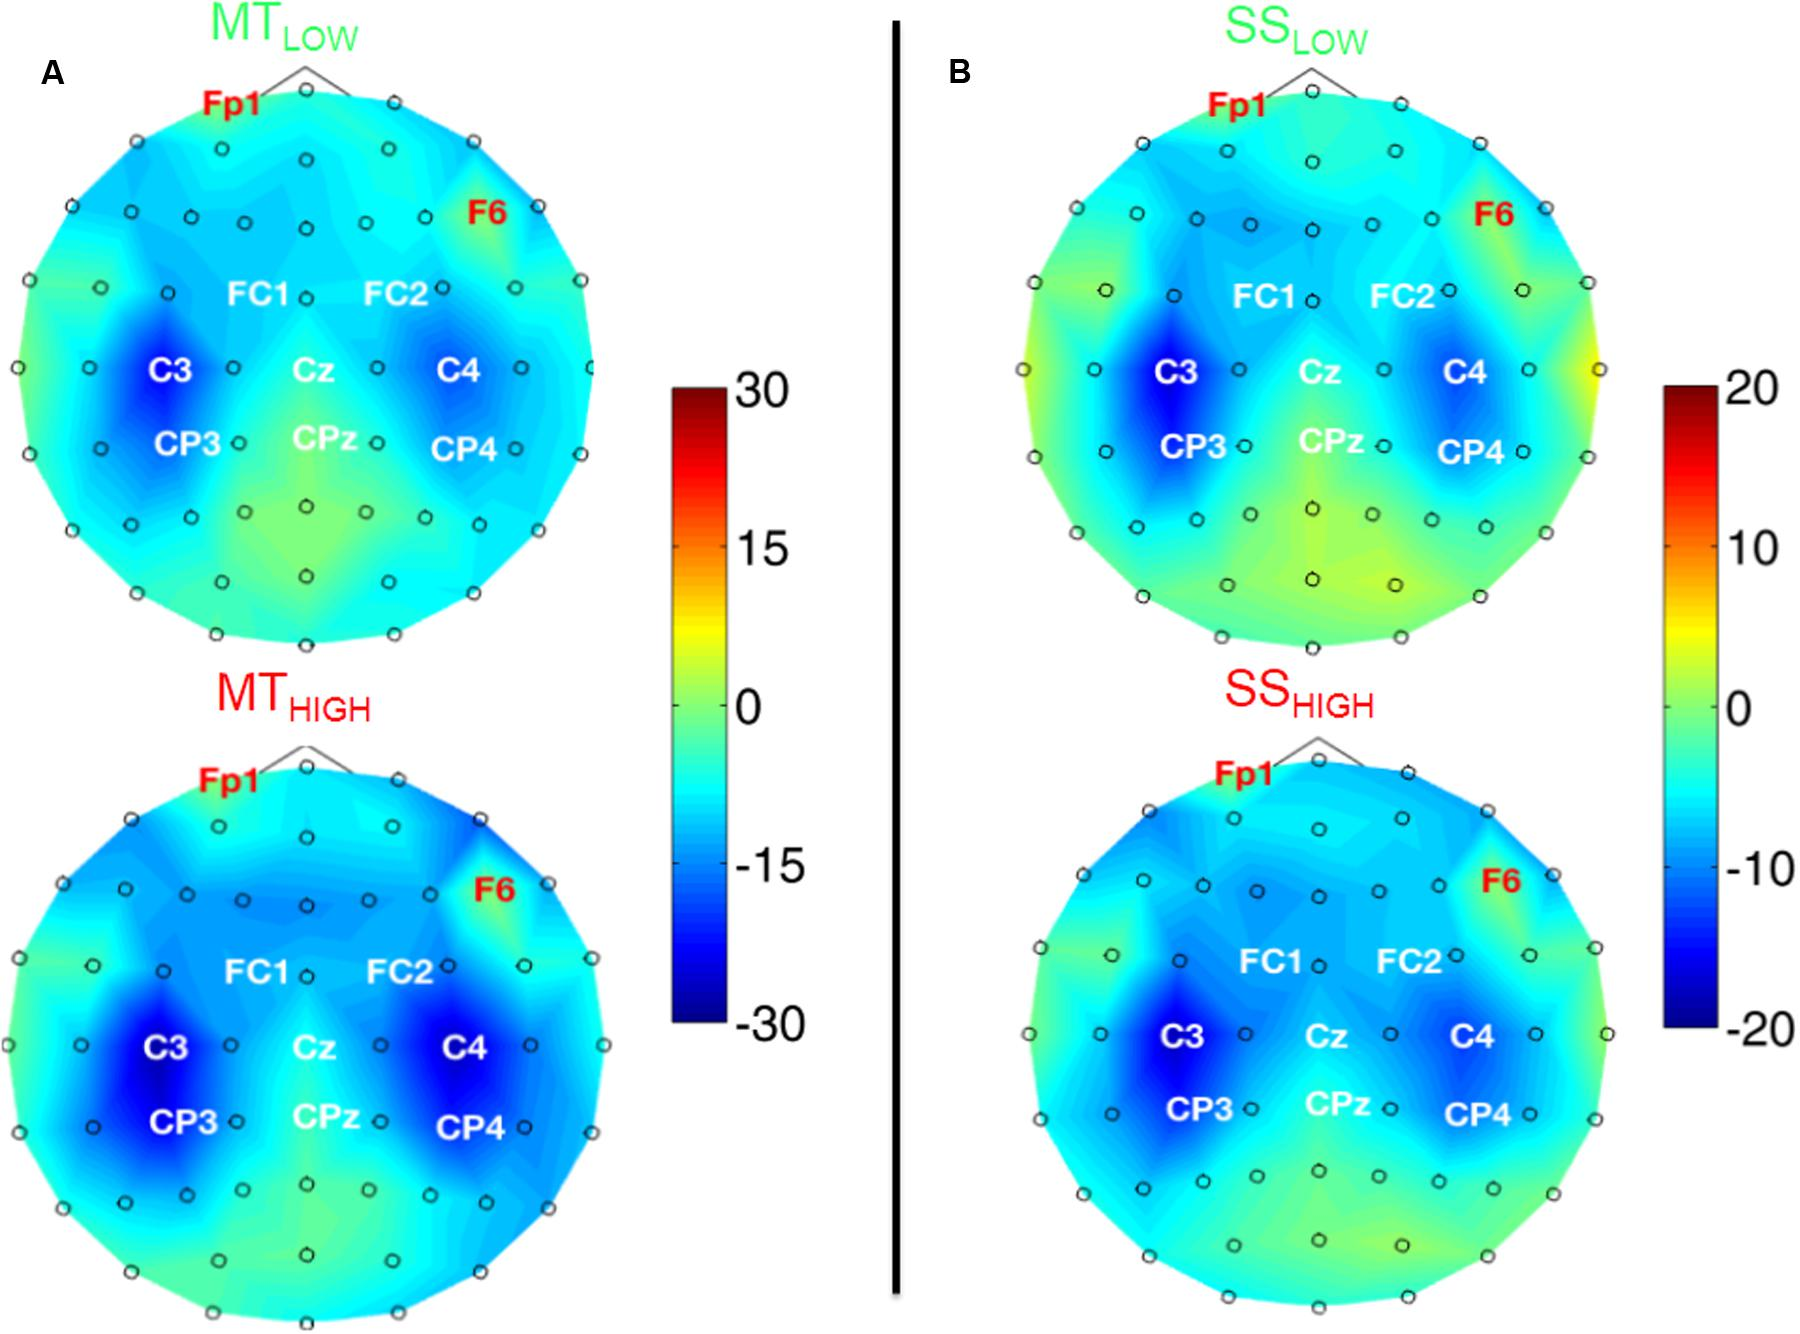 frontiers sensory feedback interferes with mu rhythm based